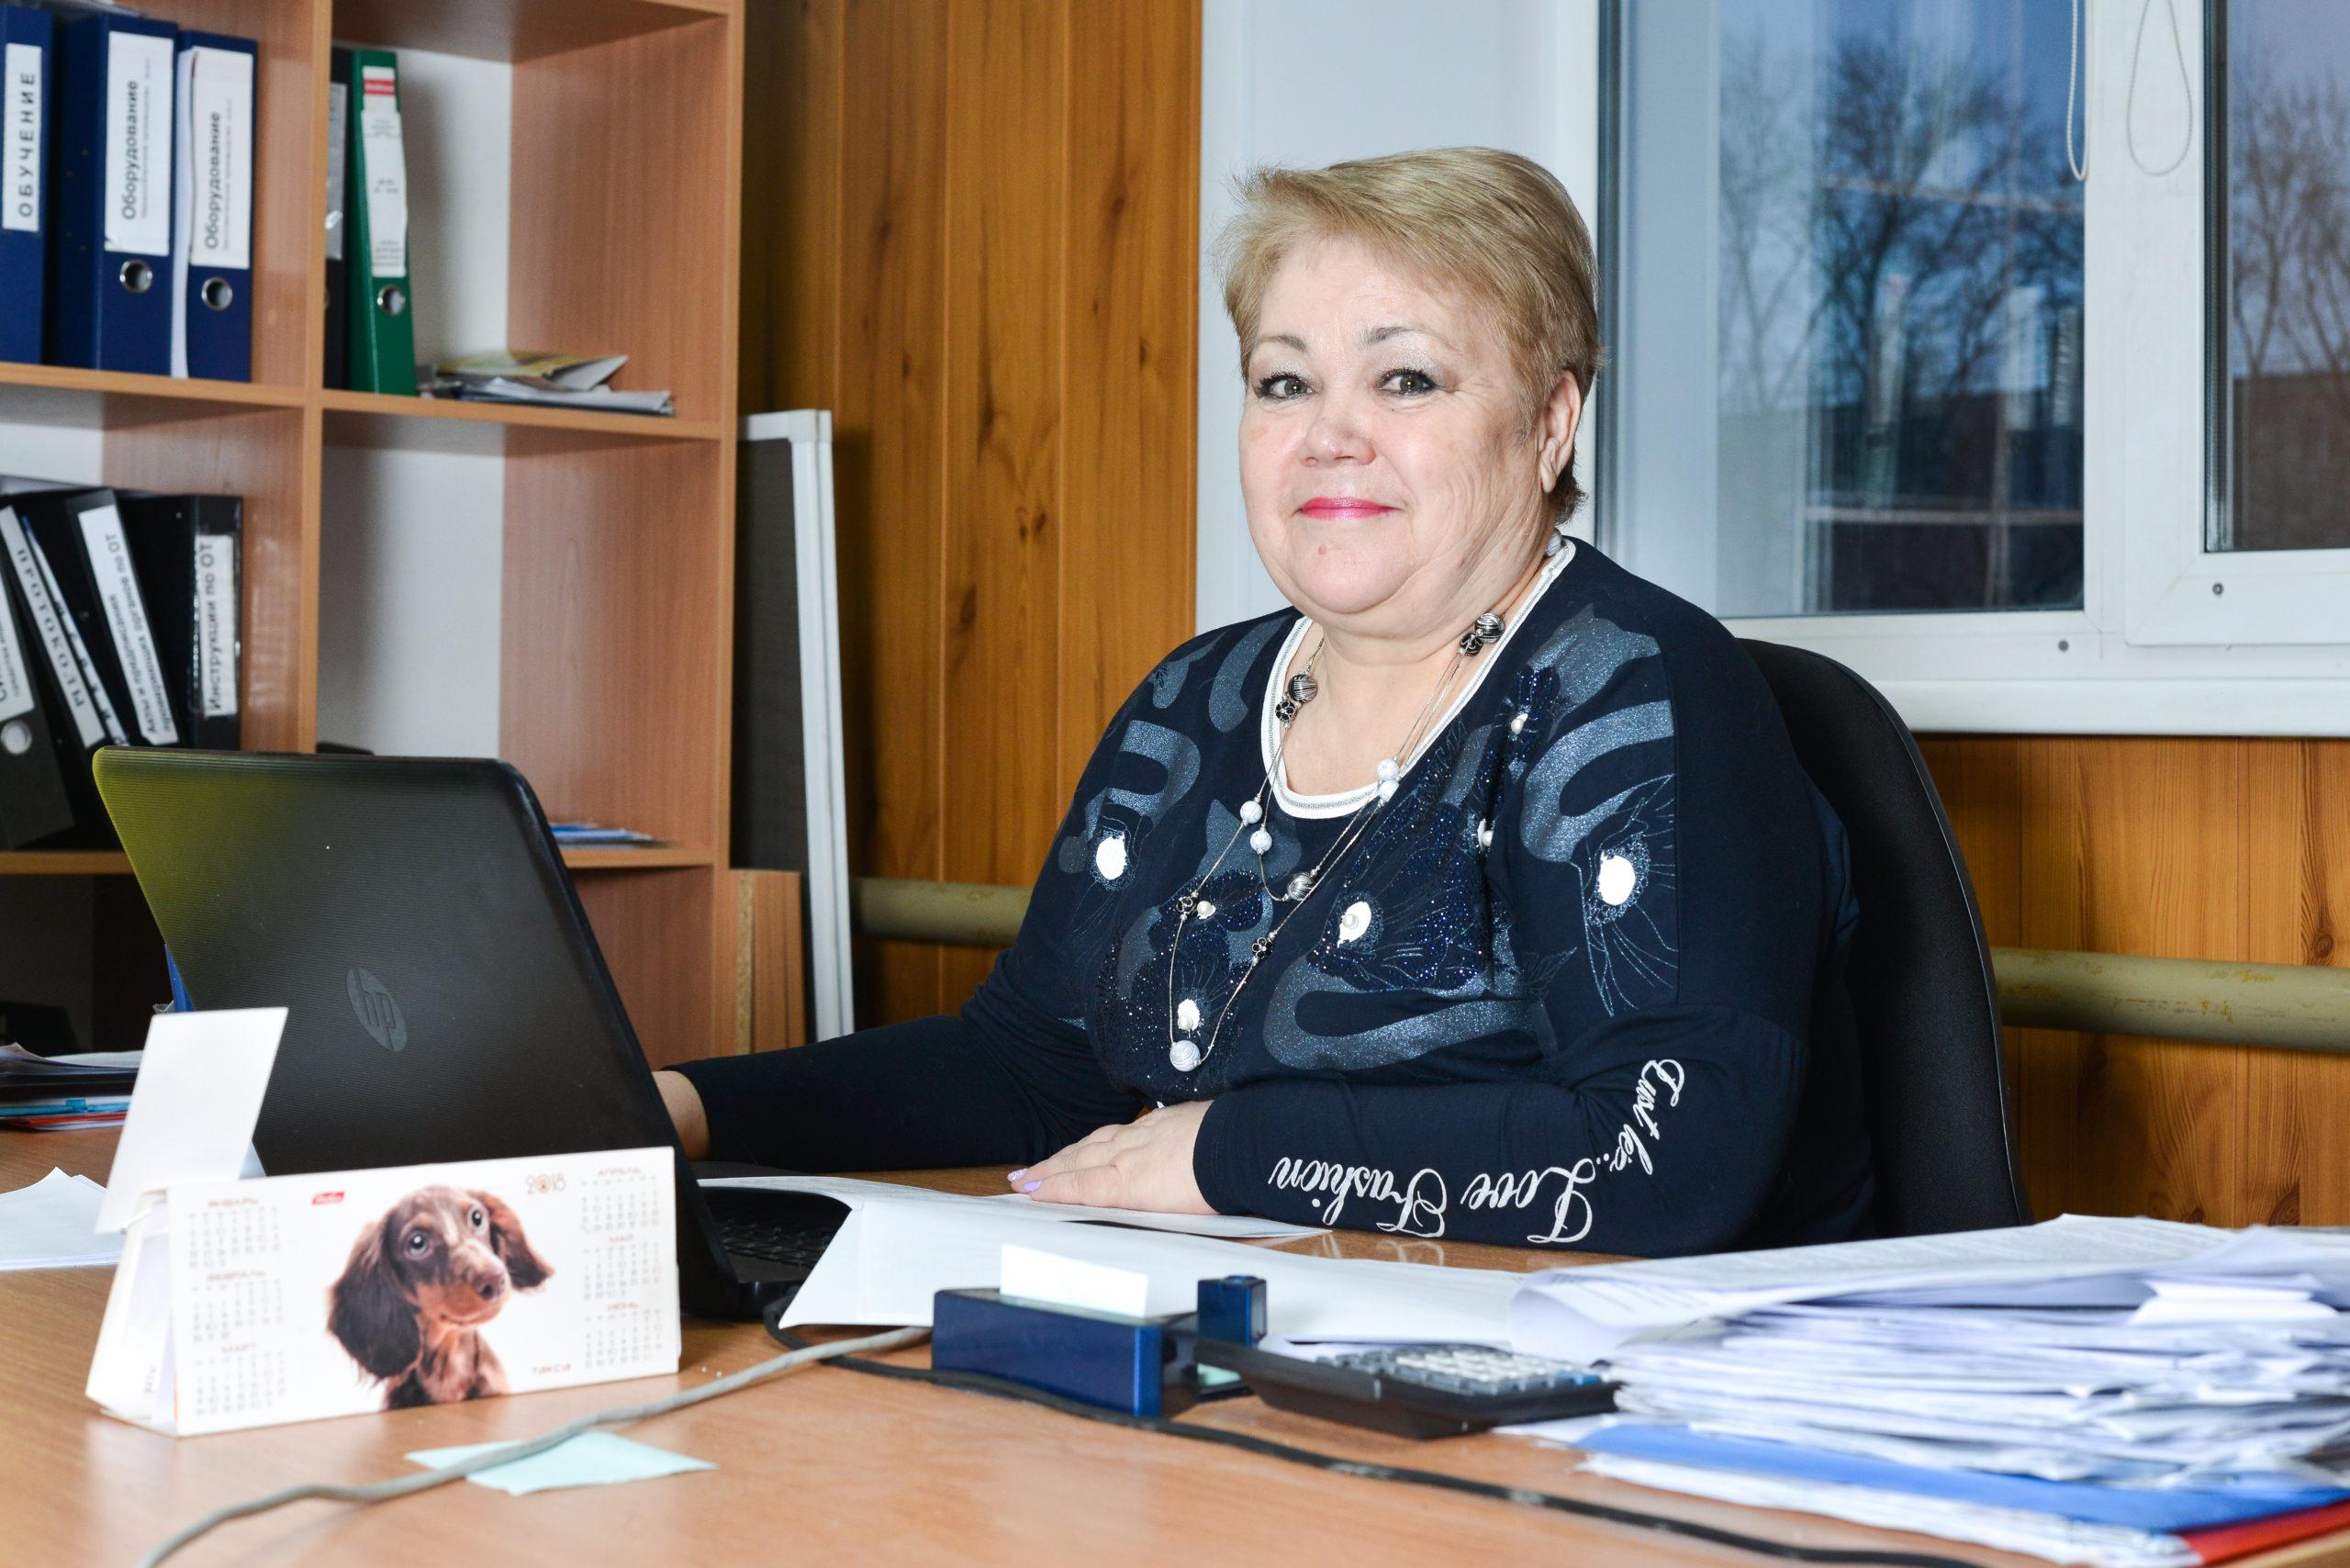 Нигаматуллина Маргарита Александровна (Специалист по охране труда)